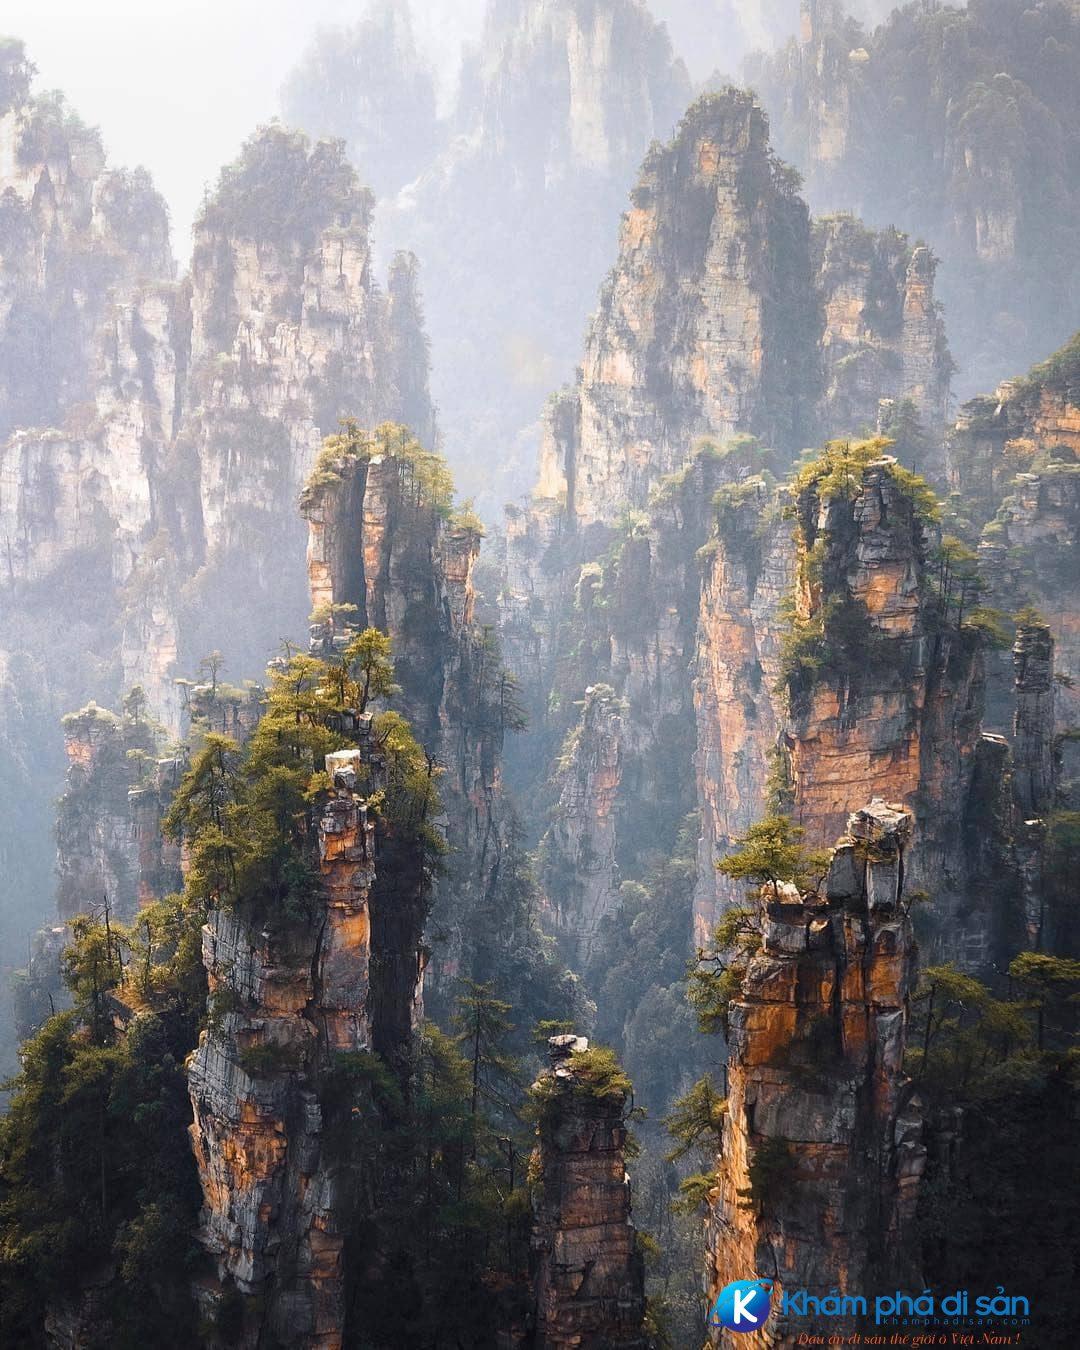 kinh nghiem du lich phuong hoang co tran khamphadisan 6